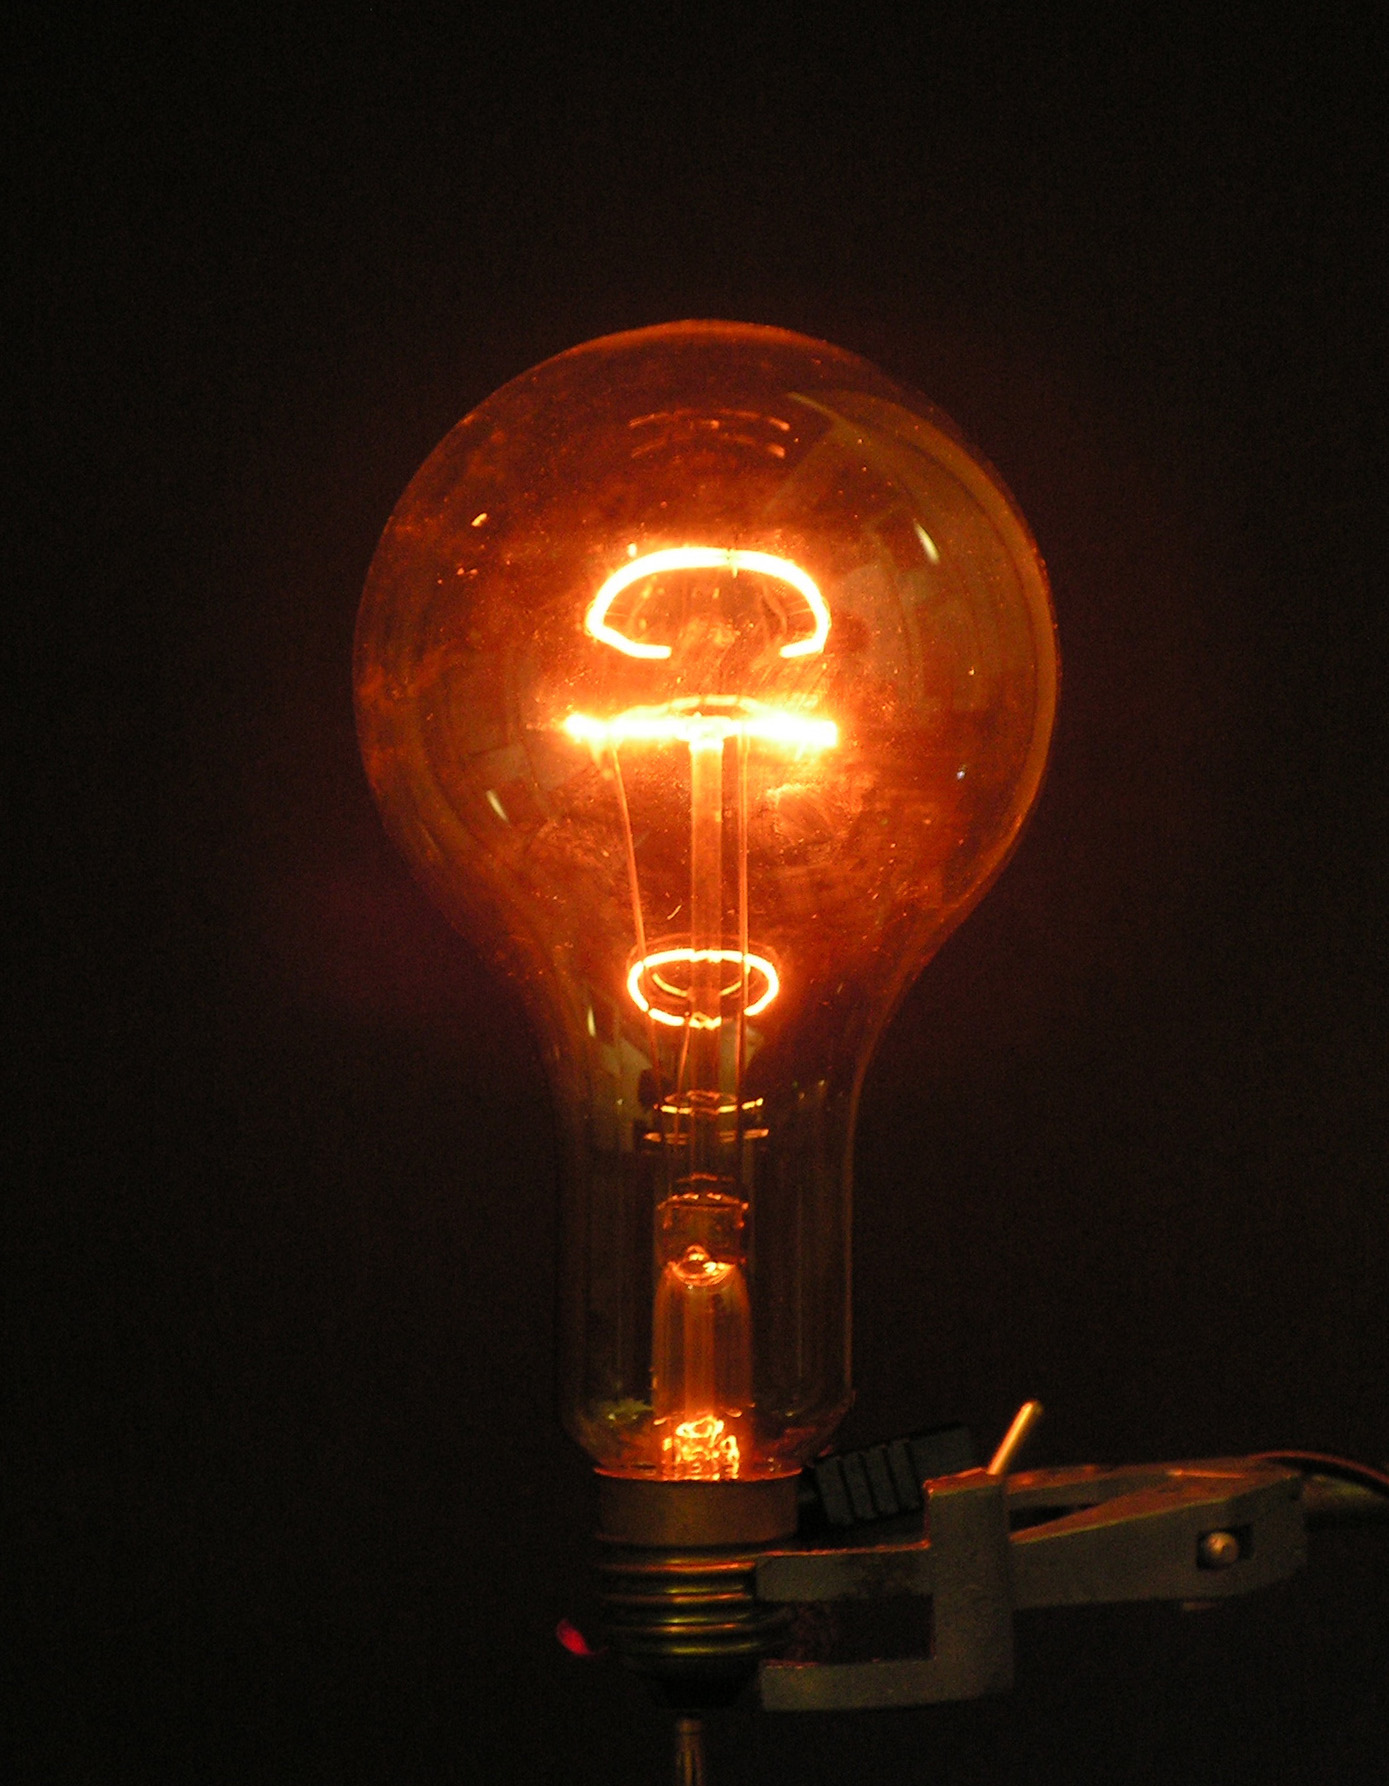 Watt Heat Lamp For Dog House